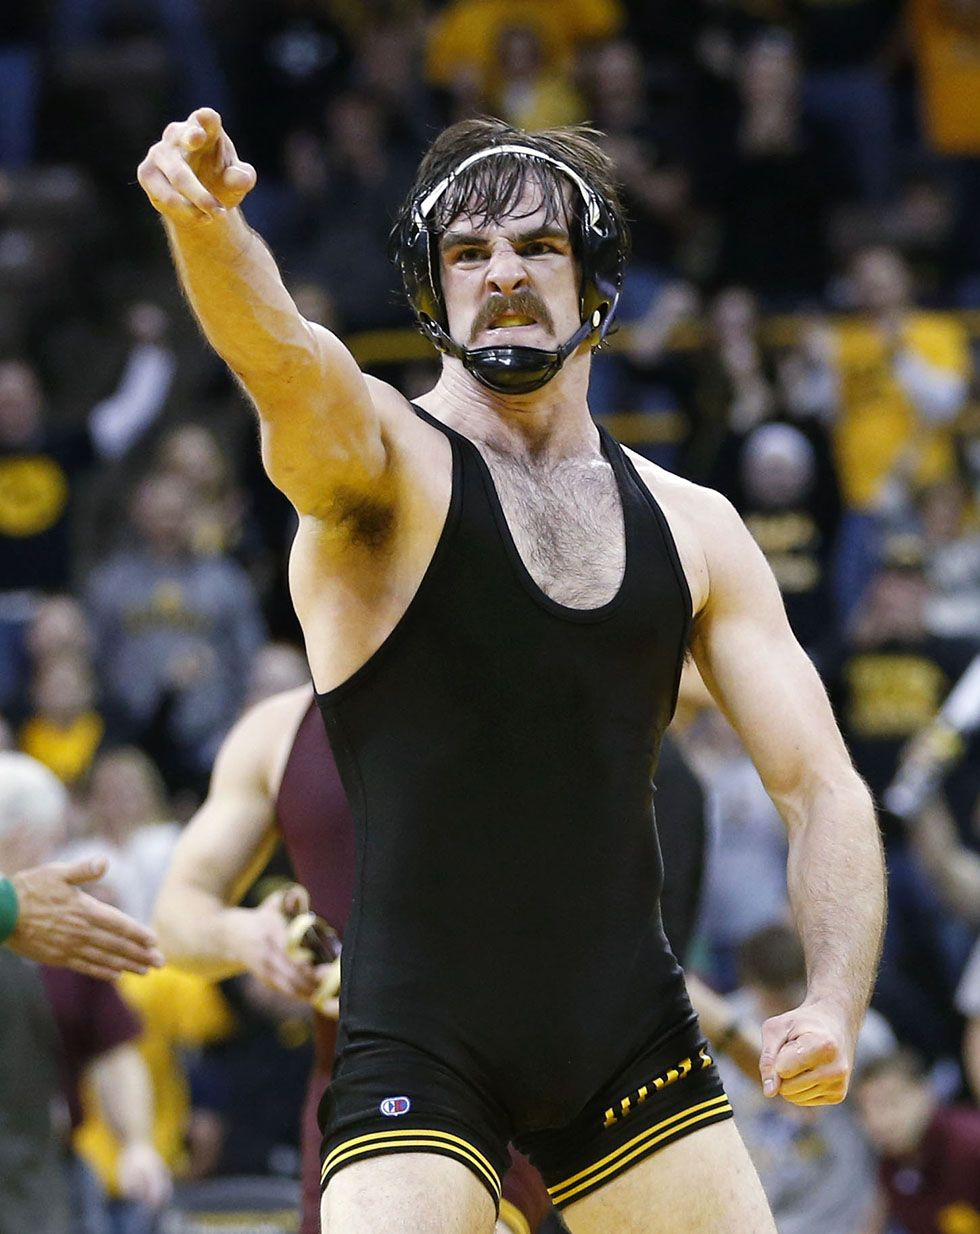 Photos Of The Week Jan 19 Jan 25 Iowa Hawkeye Wrestling